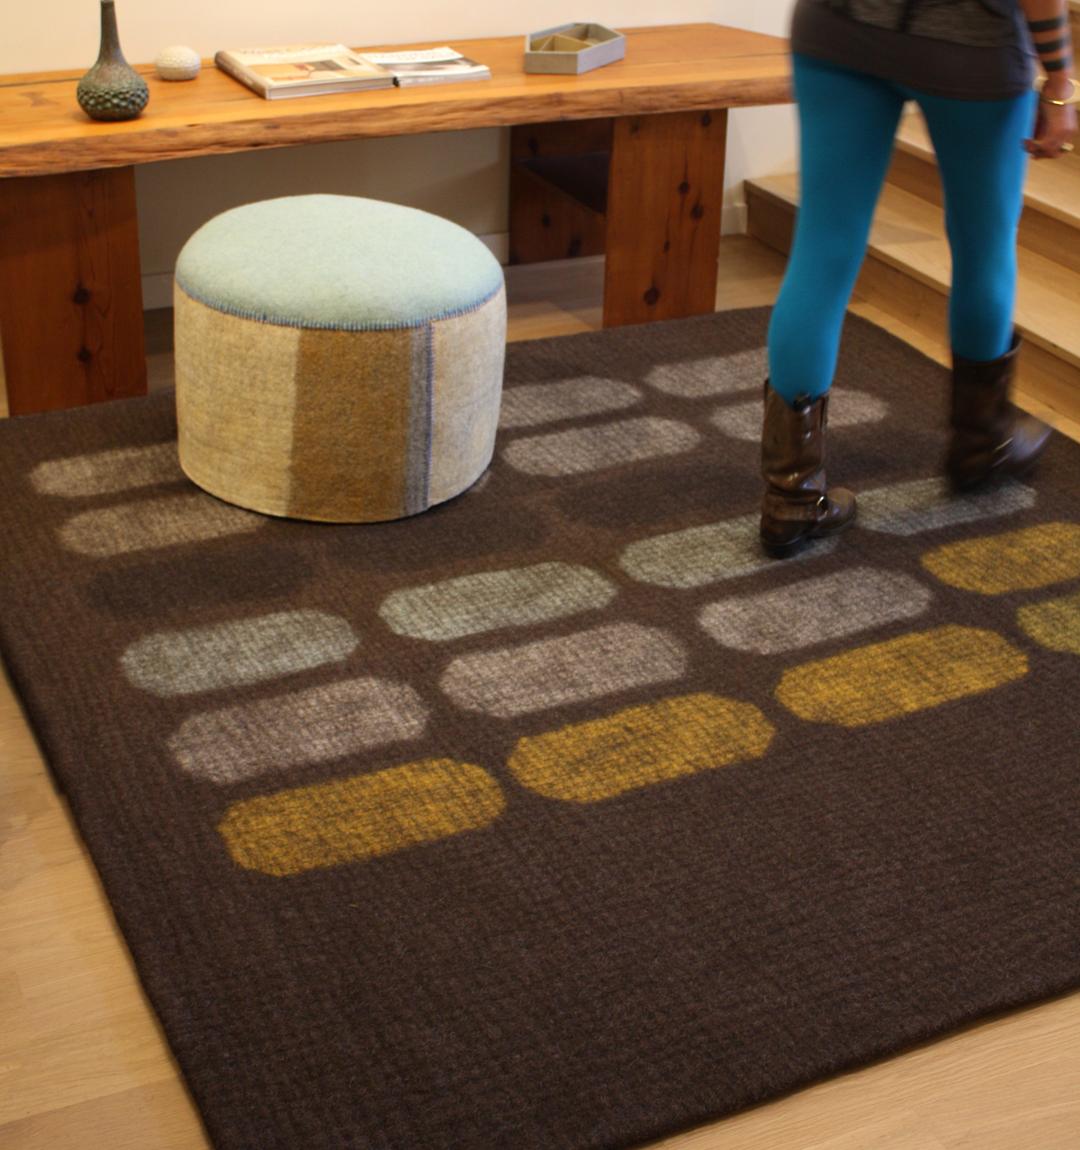 Fetish rug